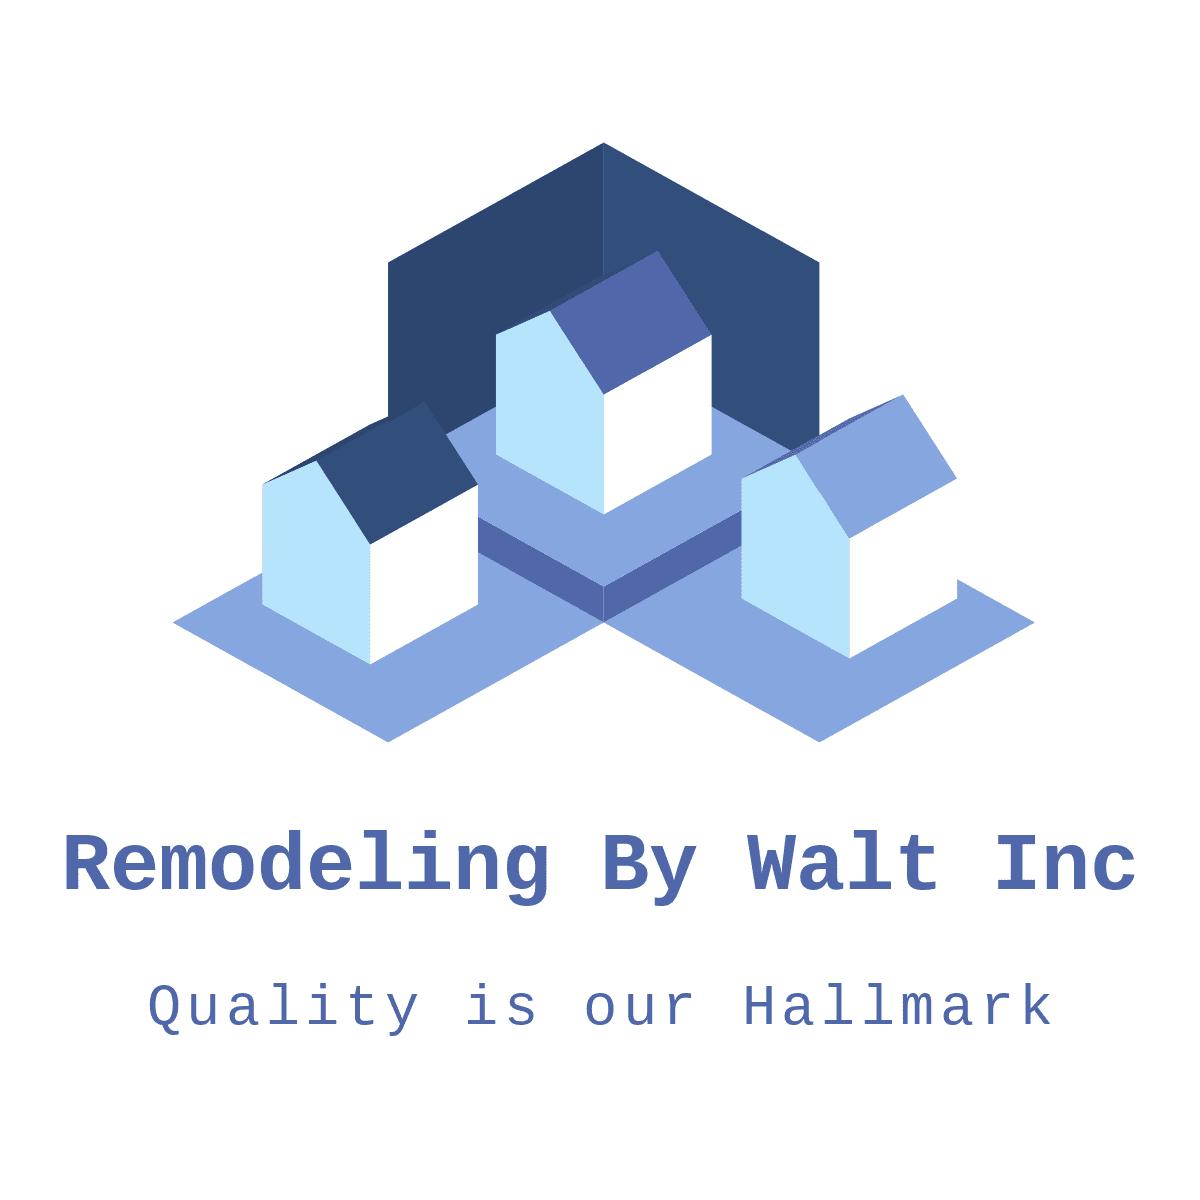 Remodeling By Walt Inc image